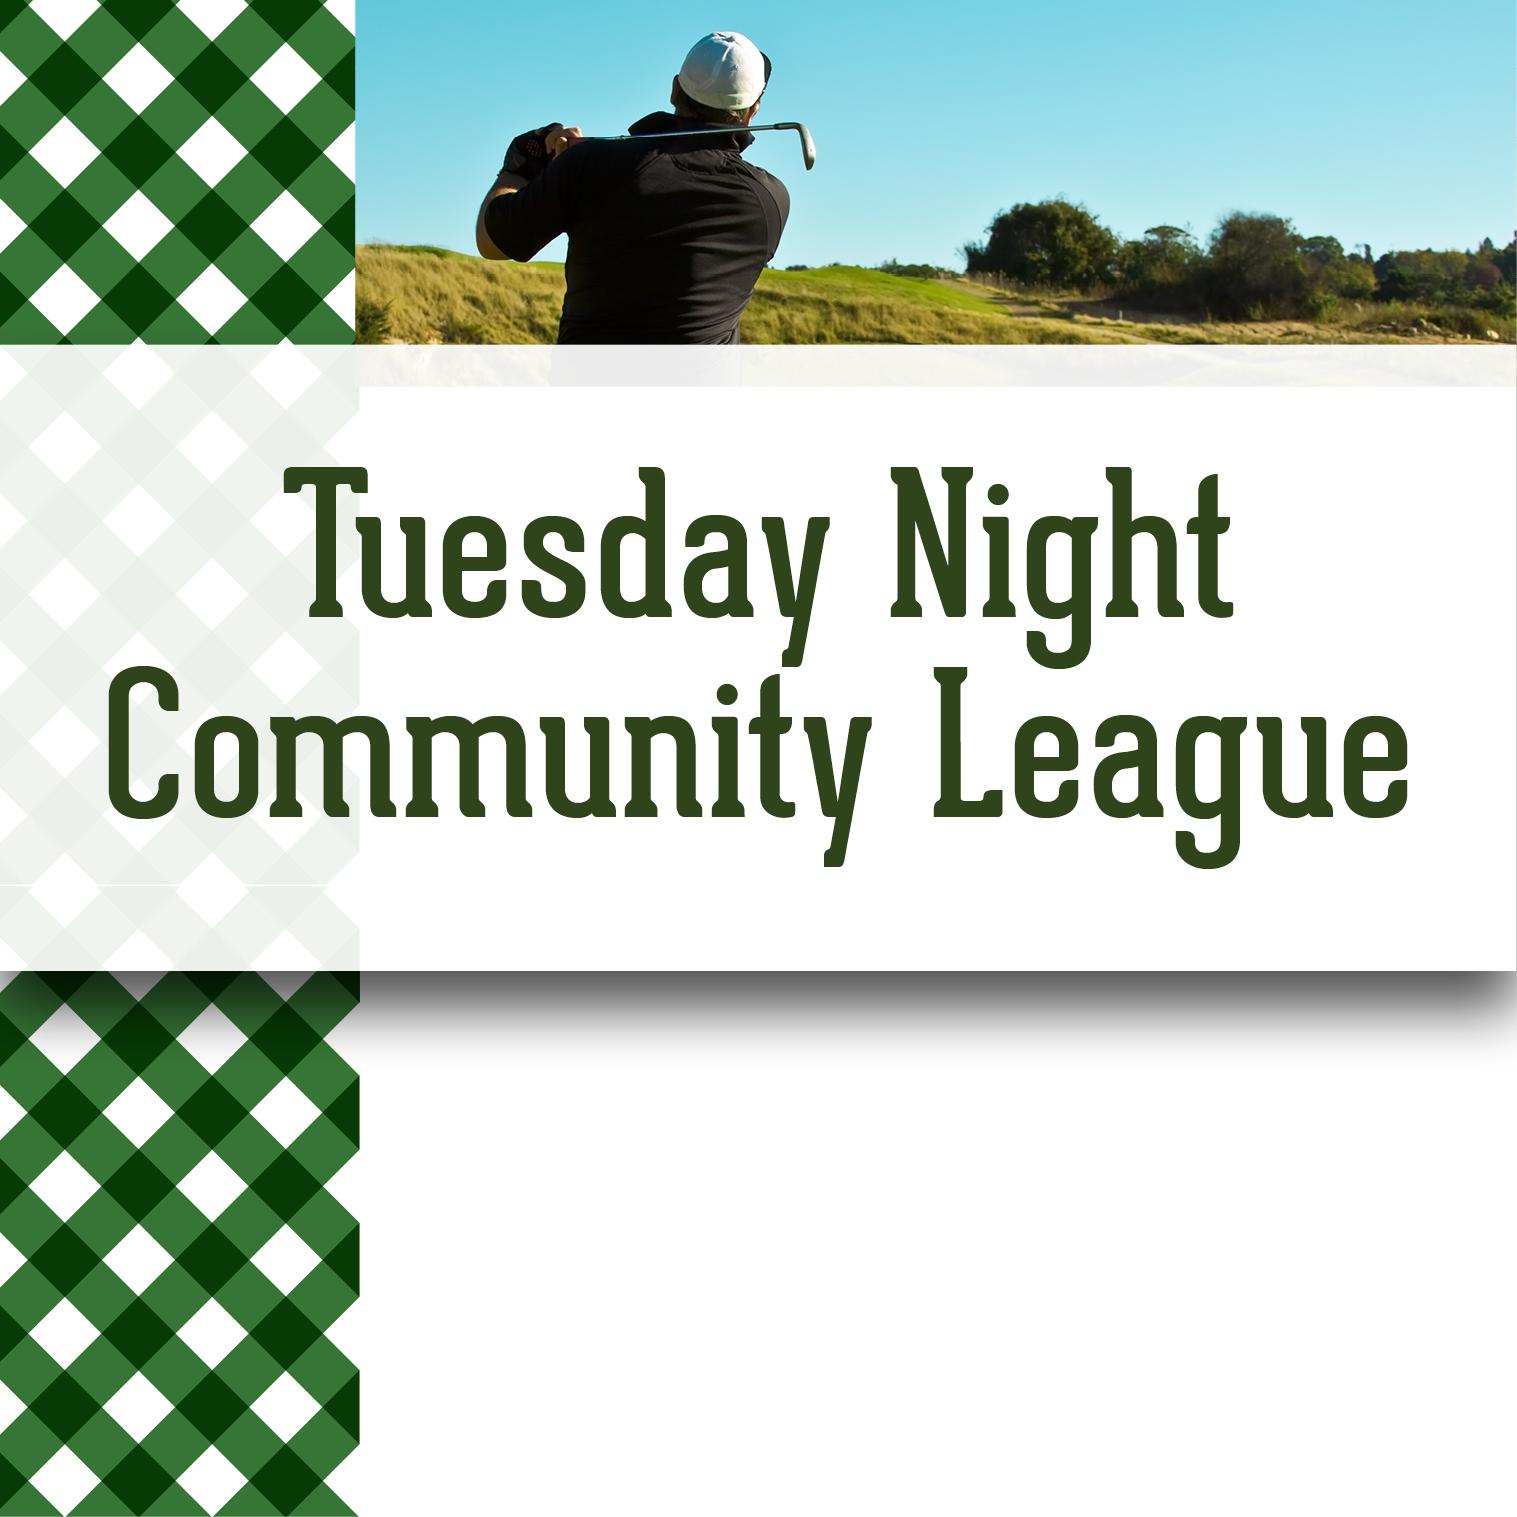 Tuesday Night Community League